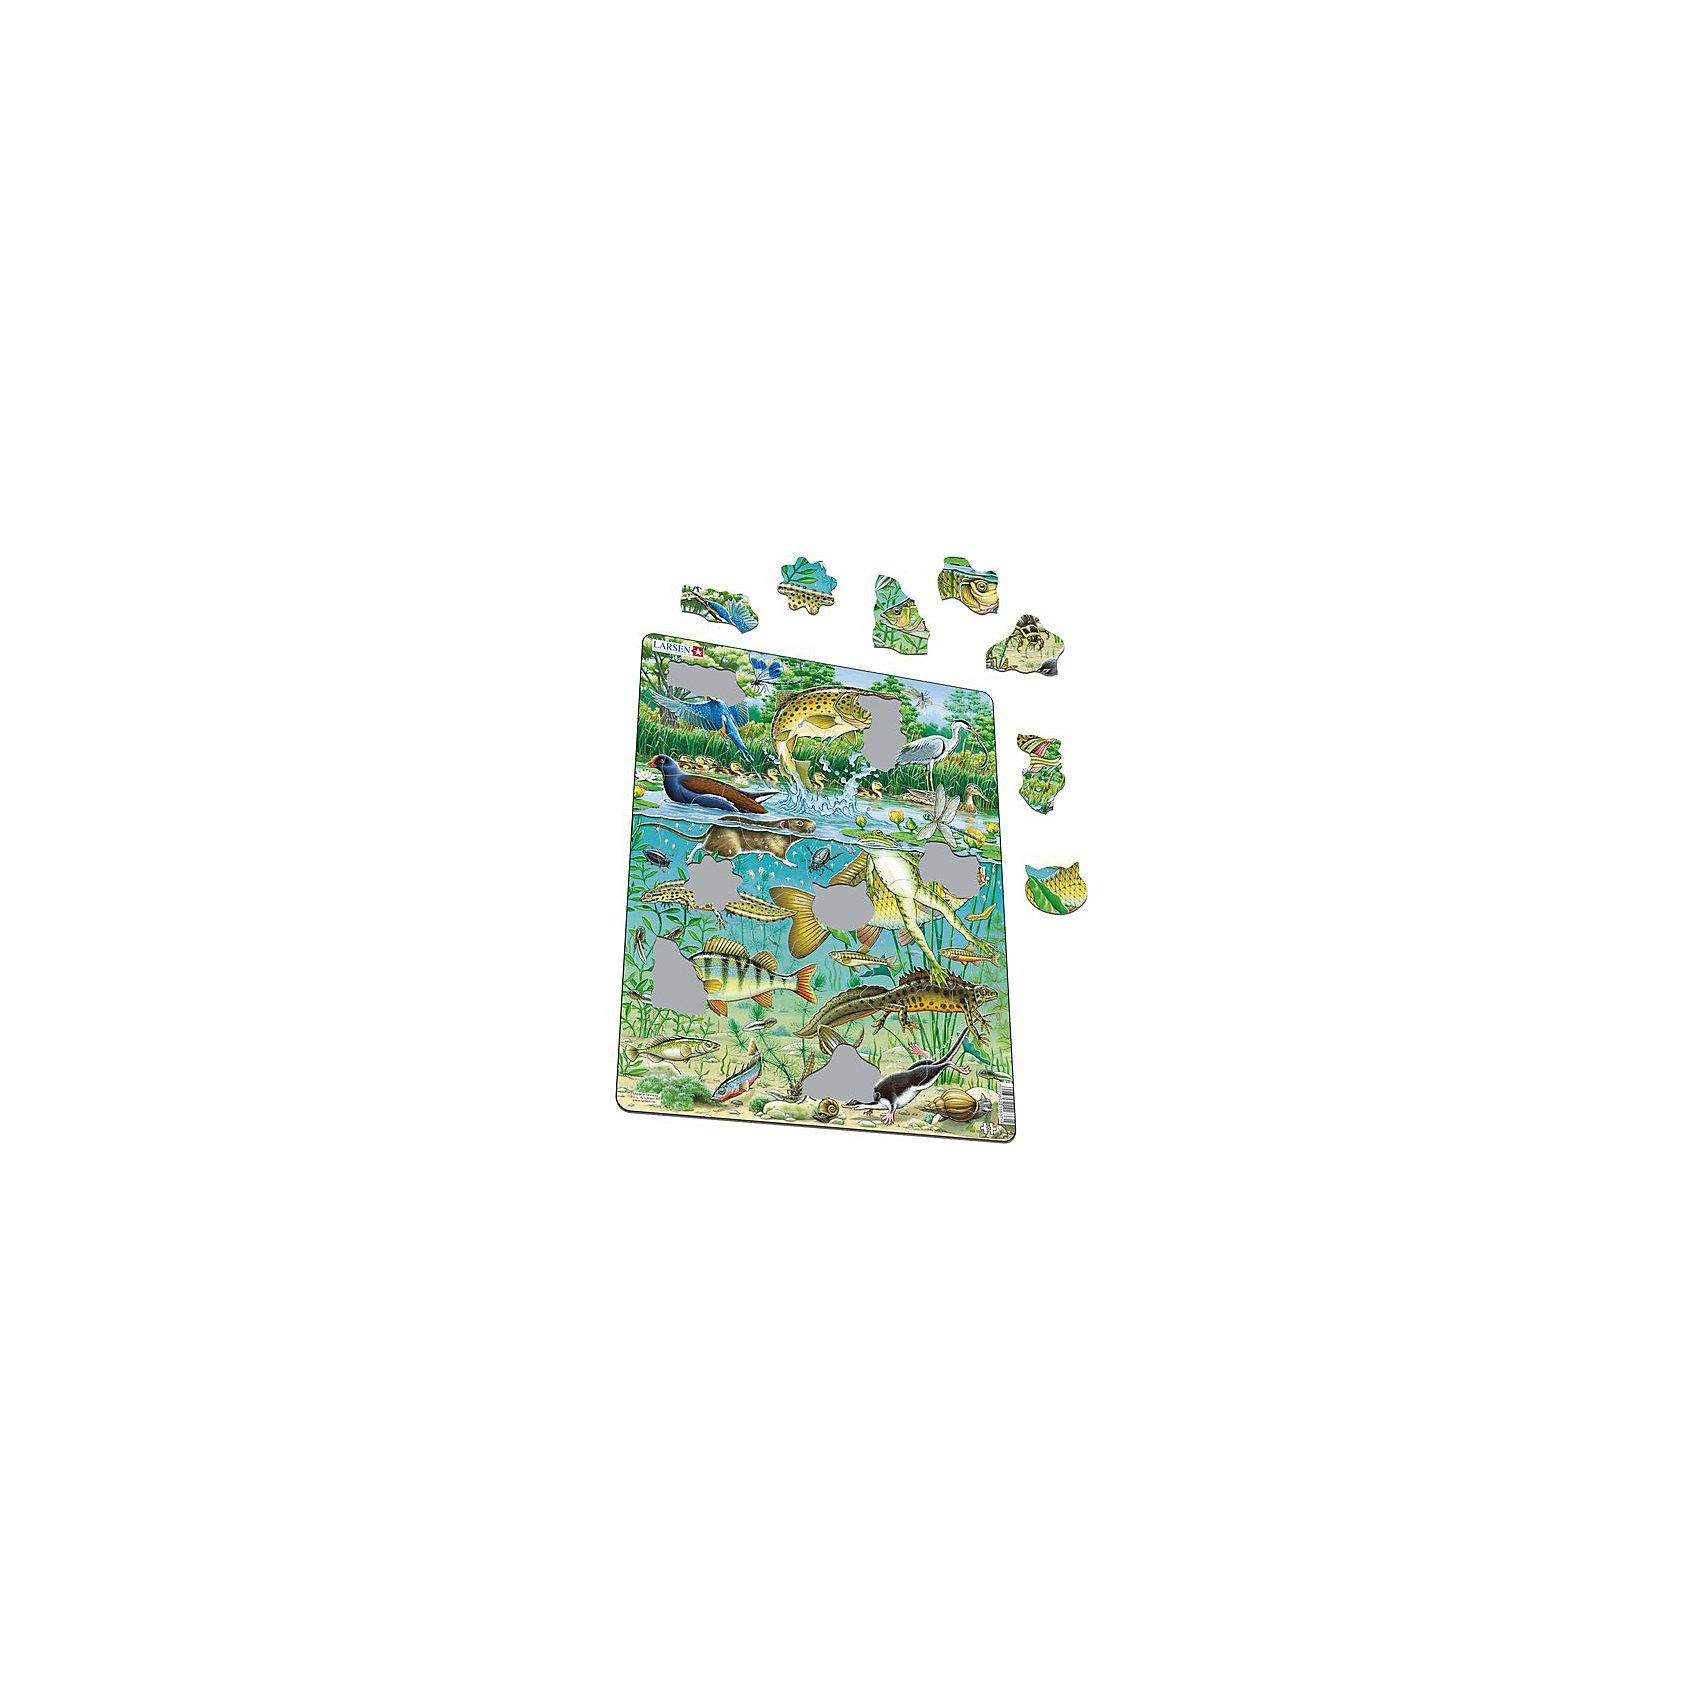 Larsen Пазл Пруд, 50 деталей, Larsen пруд садовый в екатеринбурге